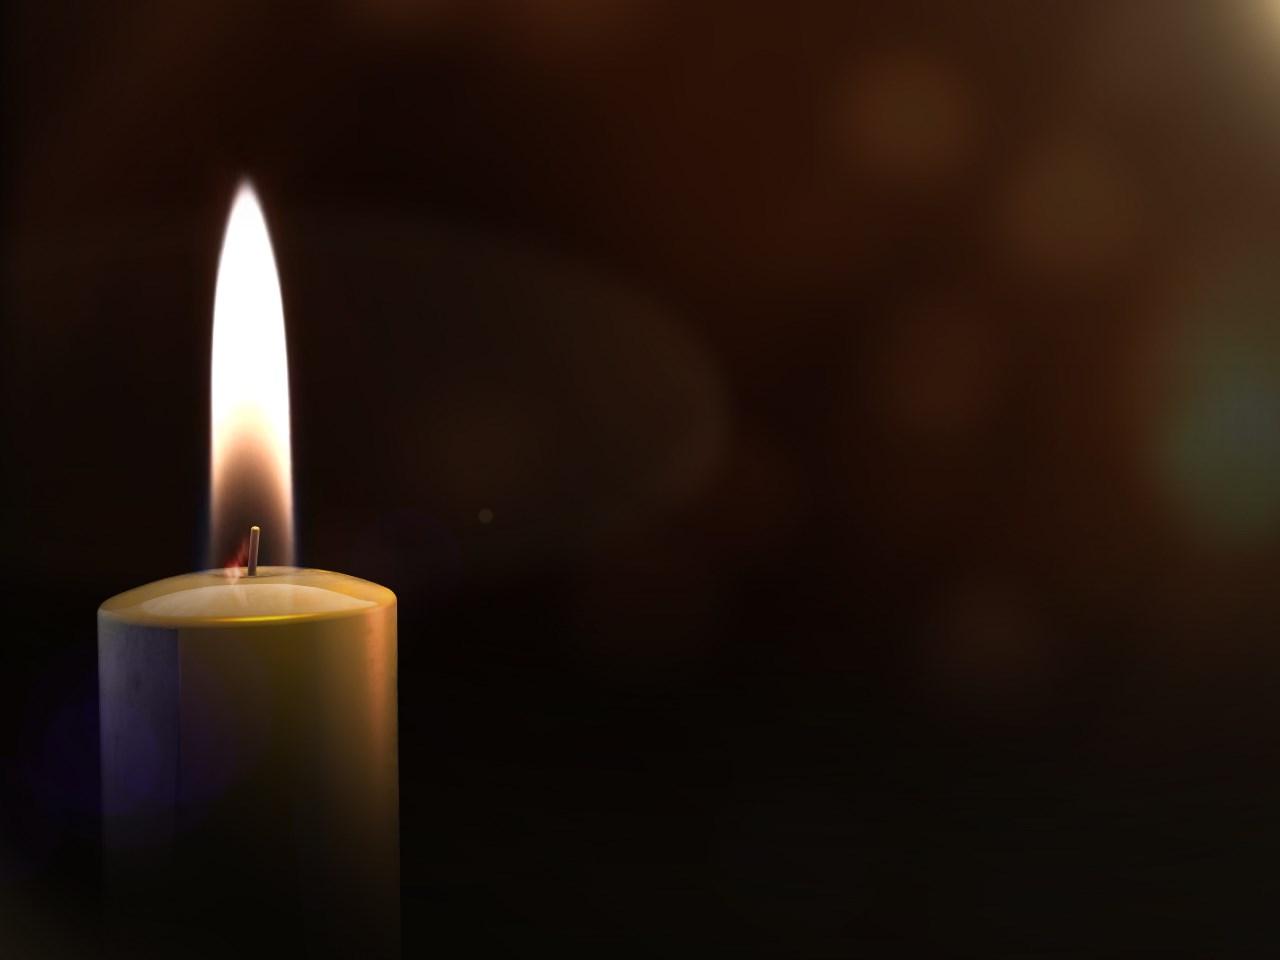 candle_1546814779768.jpg